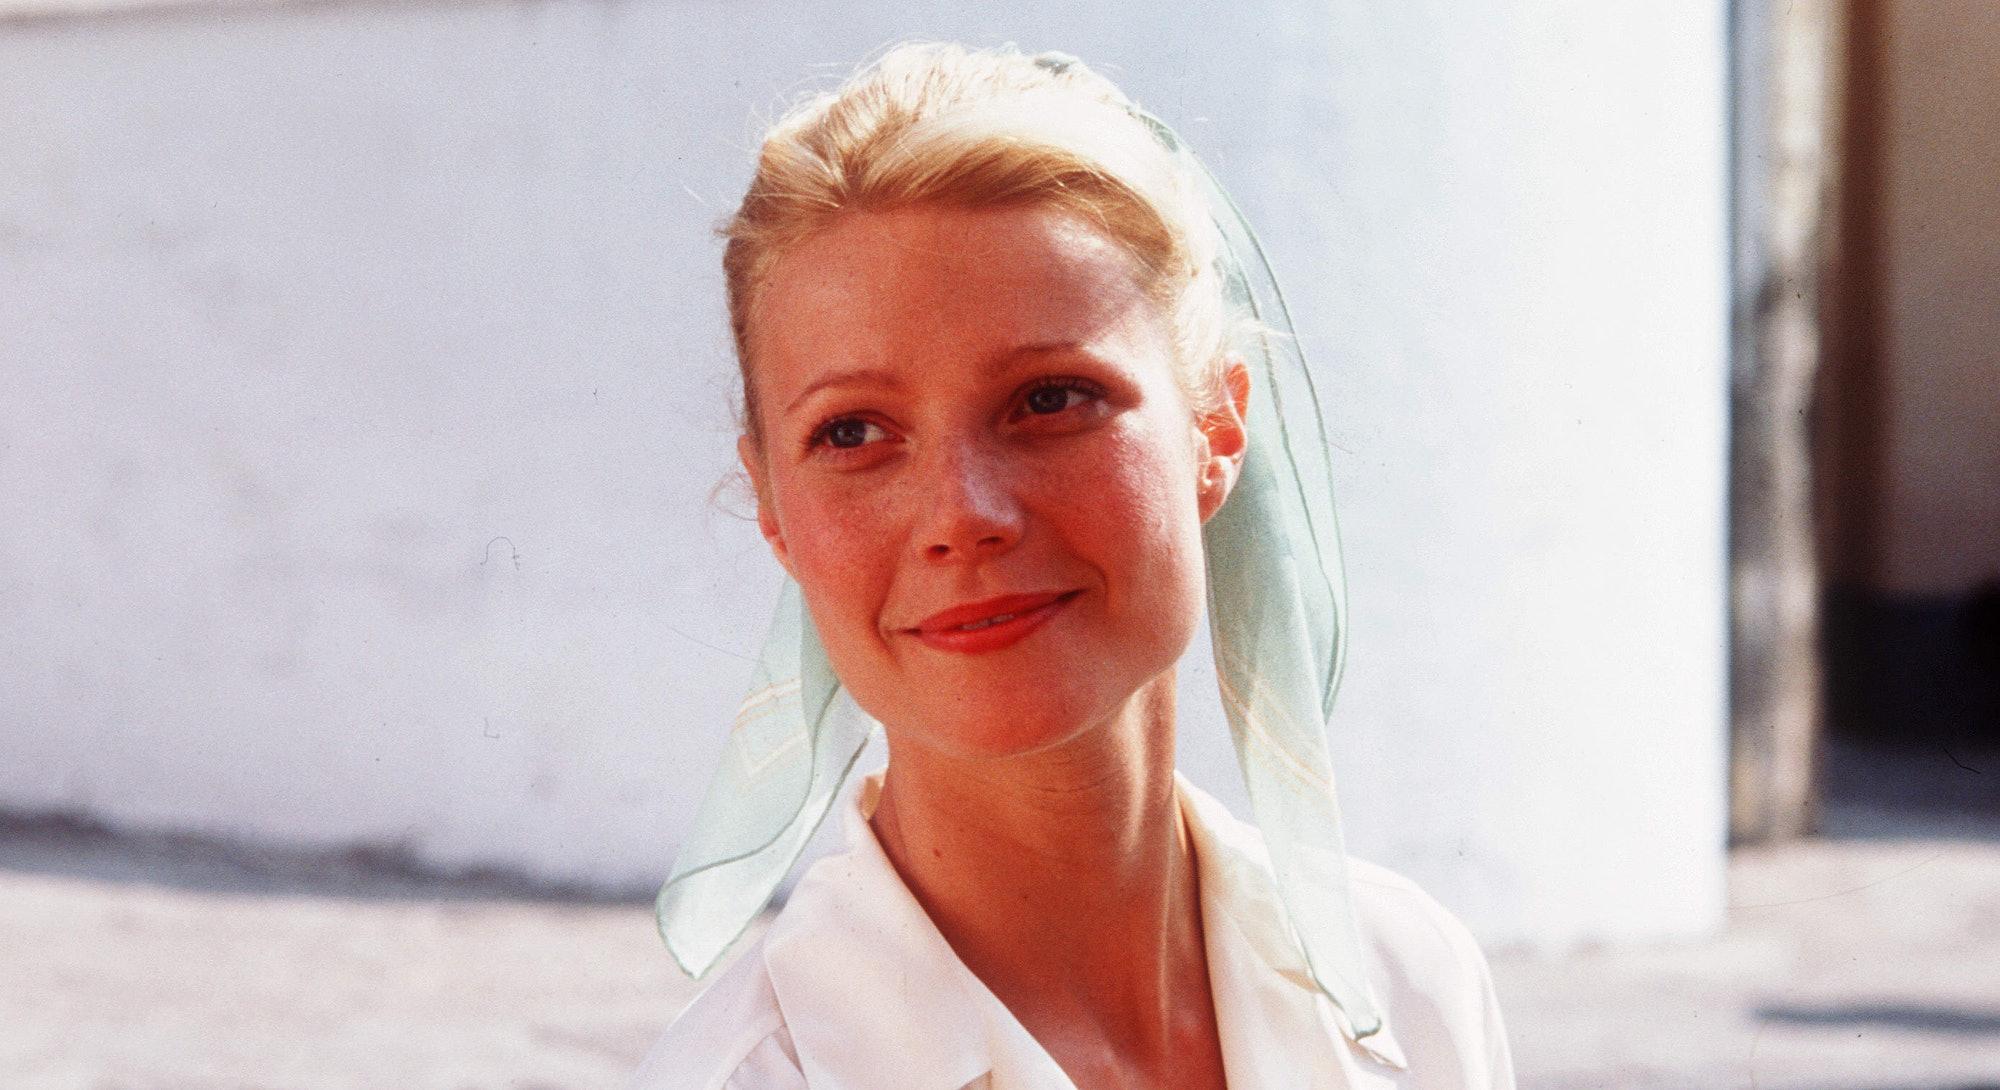 Gwenyth Paltrow In 'The Talented Mr. Ripley.'